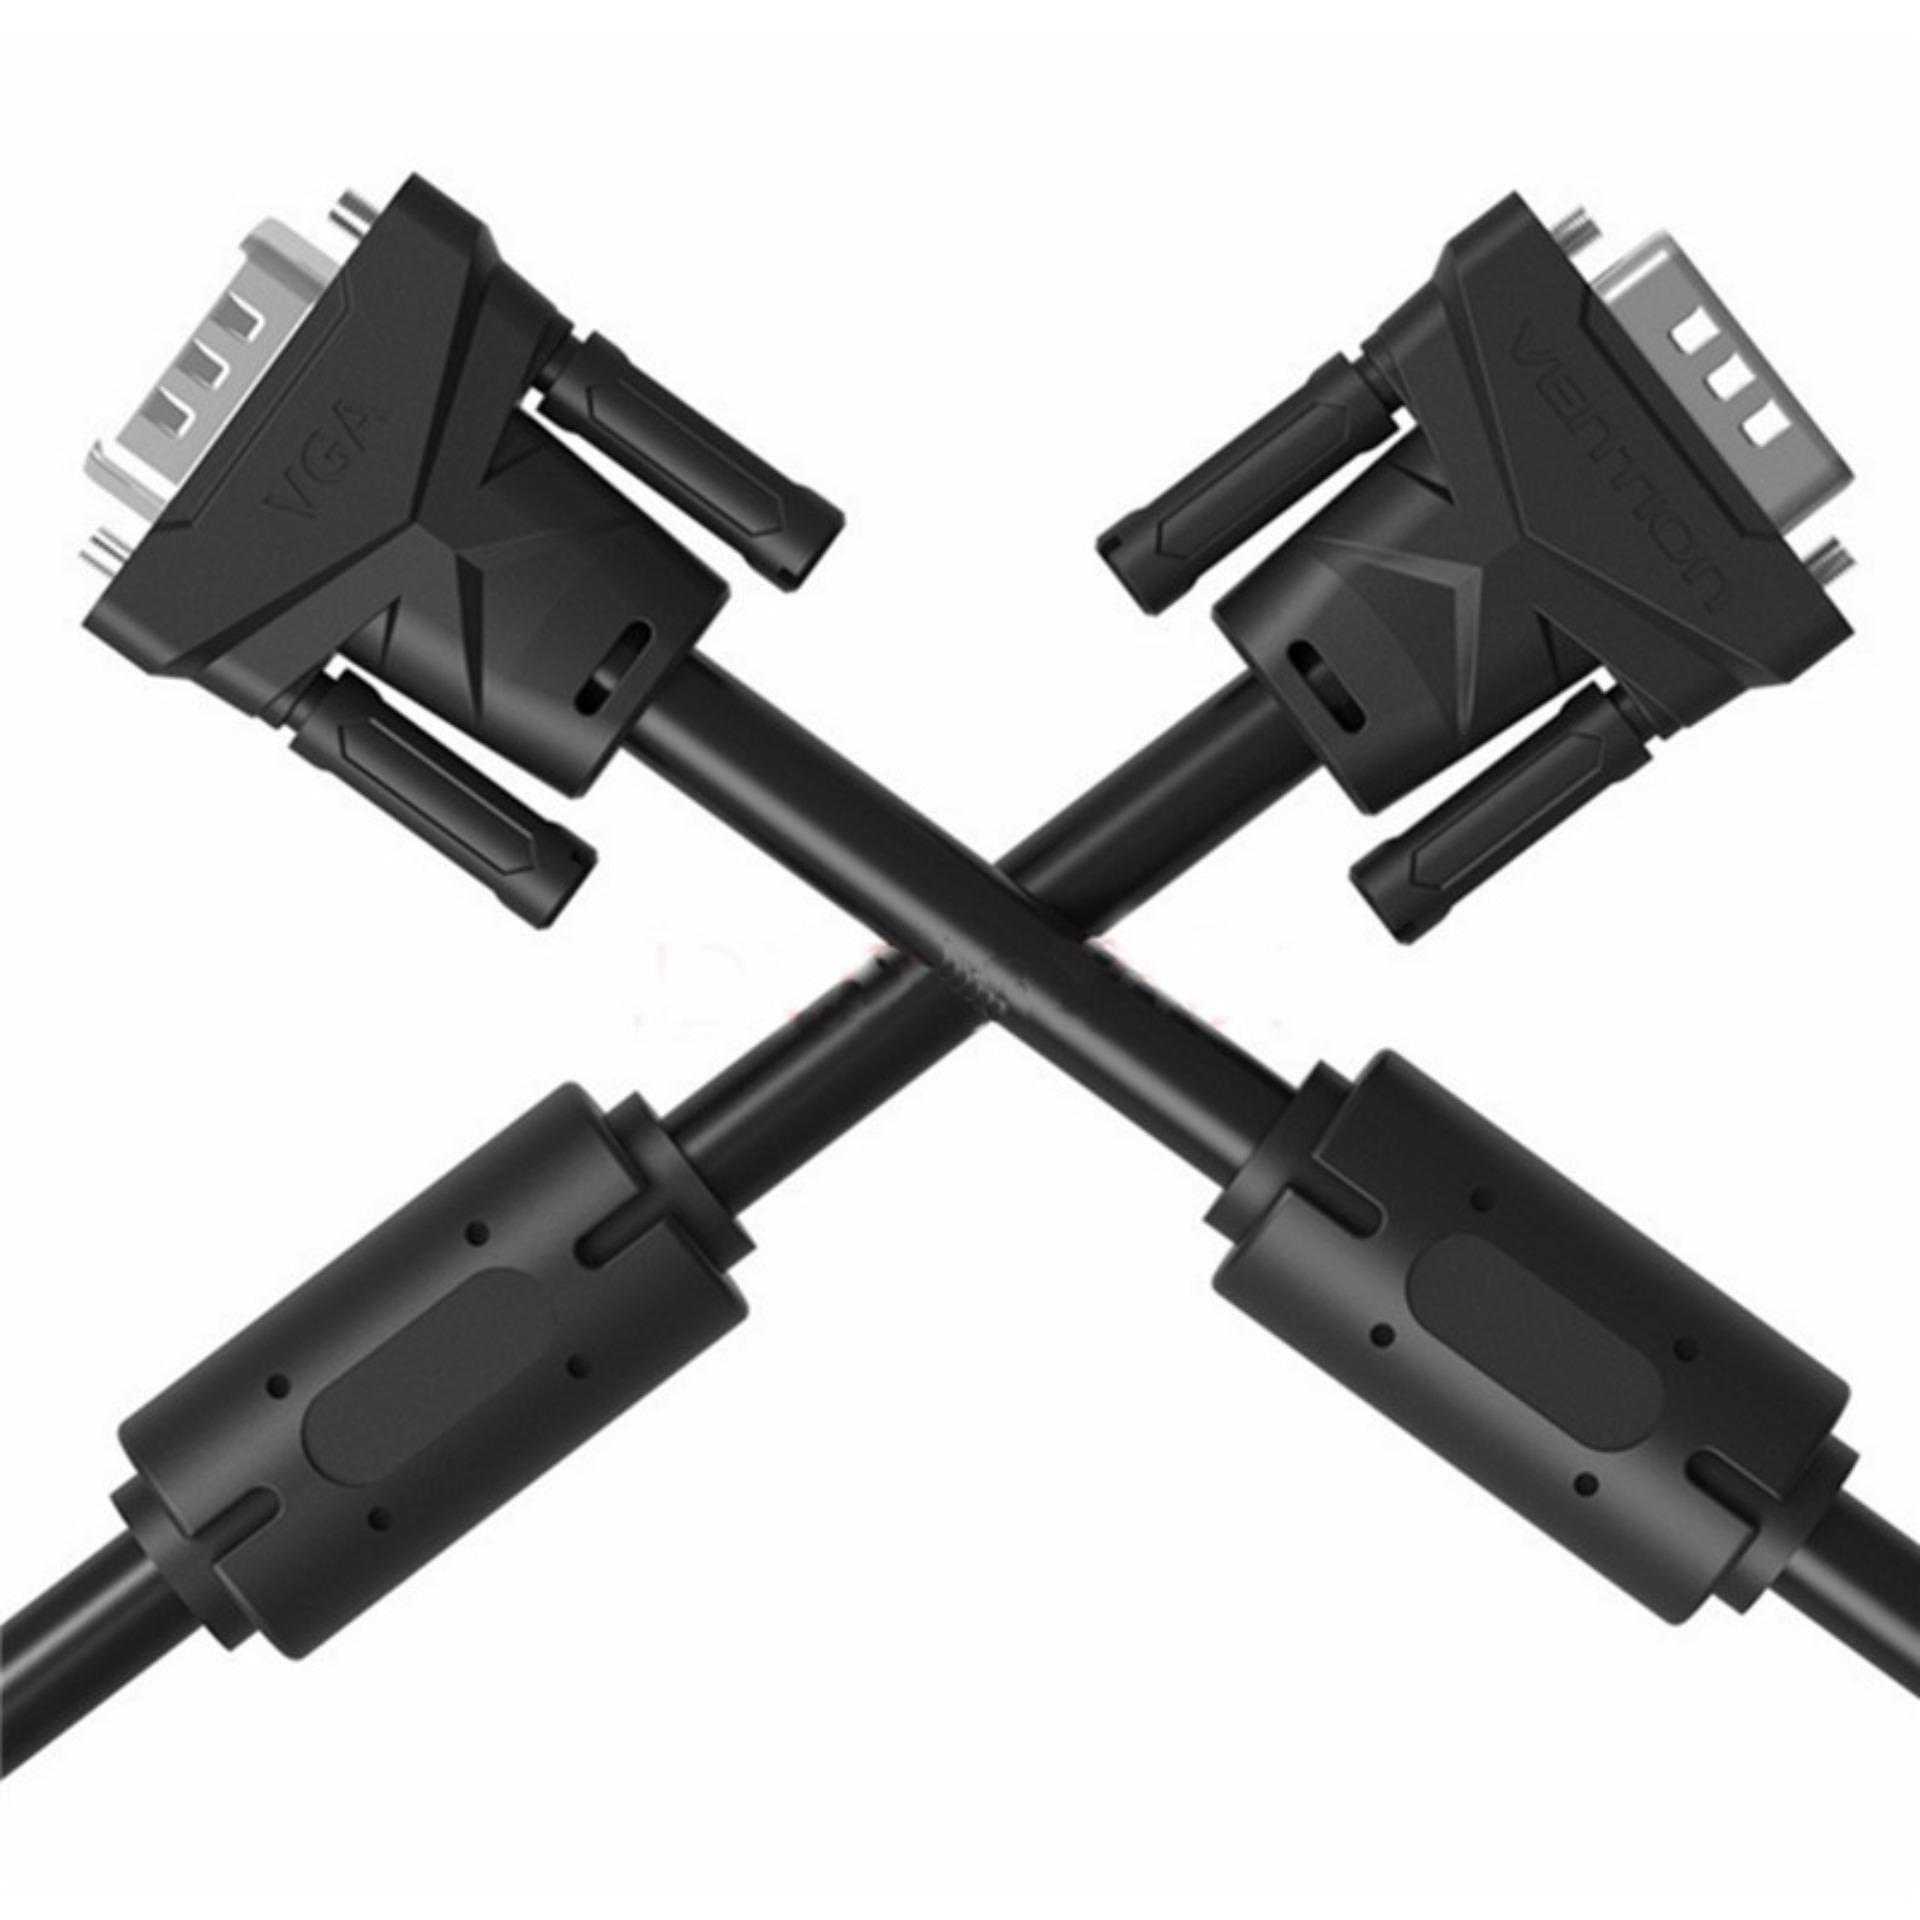 Harga Terendah Vention B04 3m Kabel Vga Male To Premium Quality